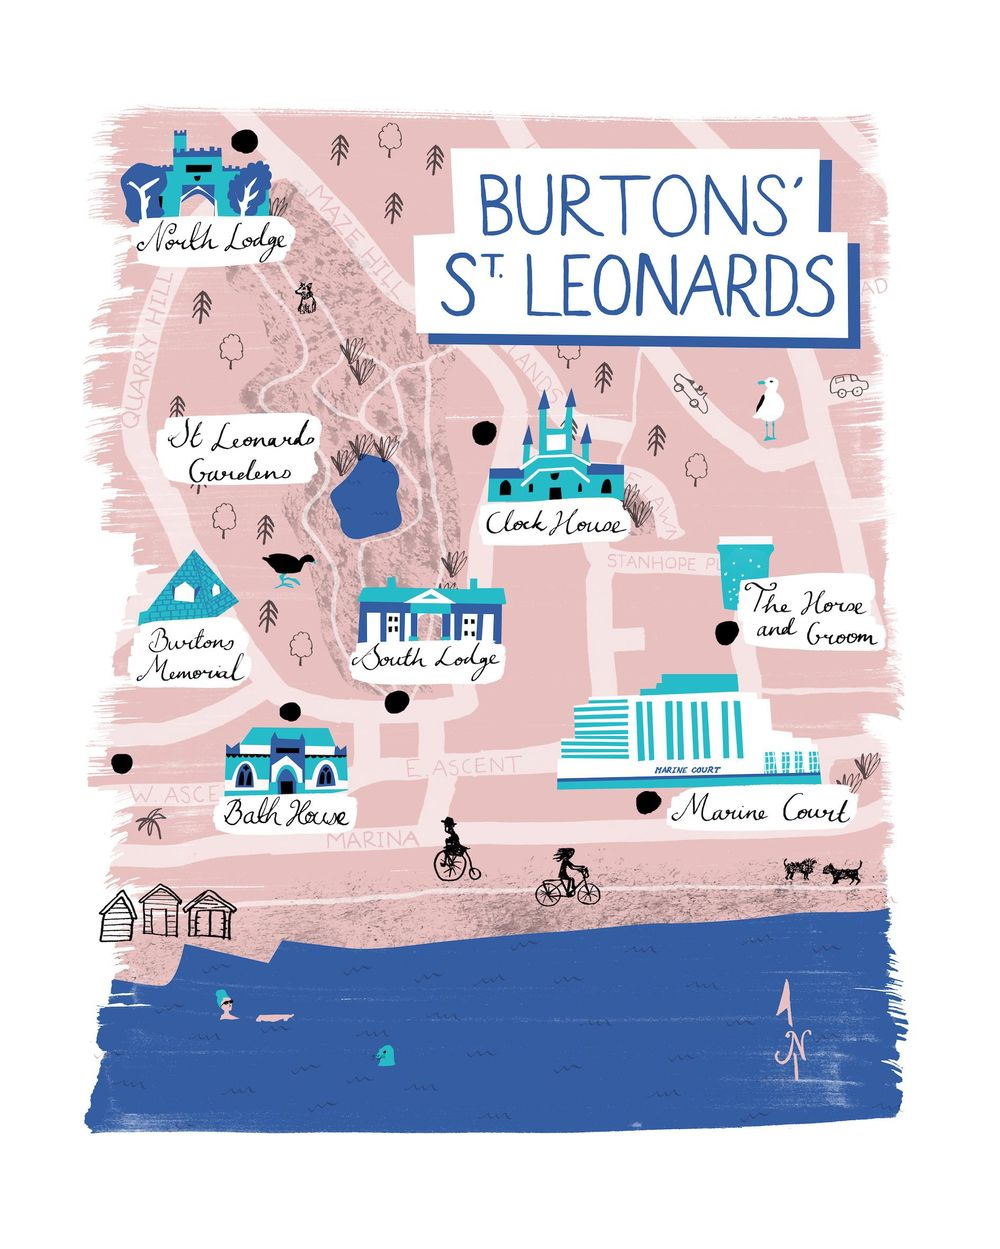 St Leonards Map - image 5 - student project